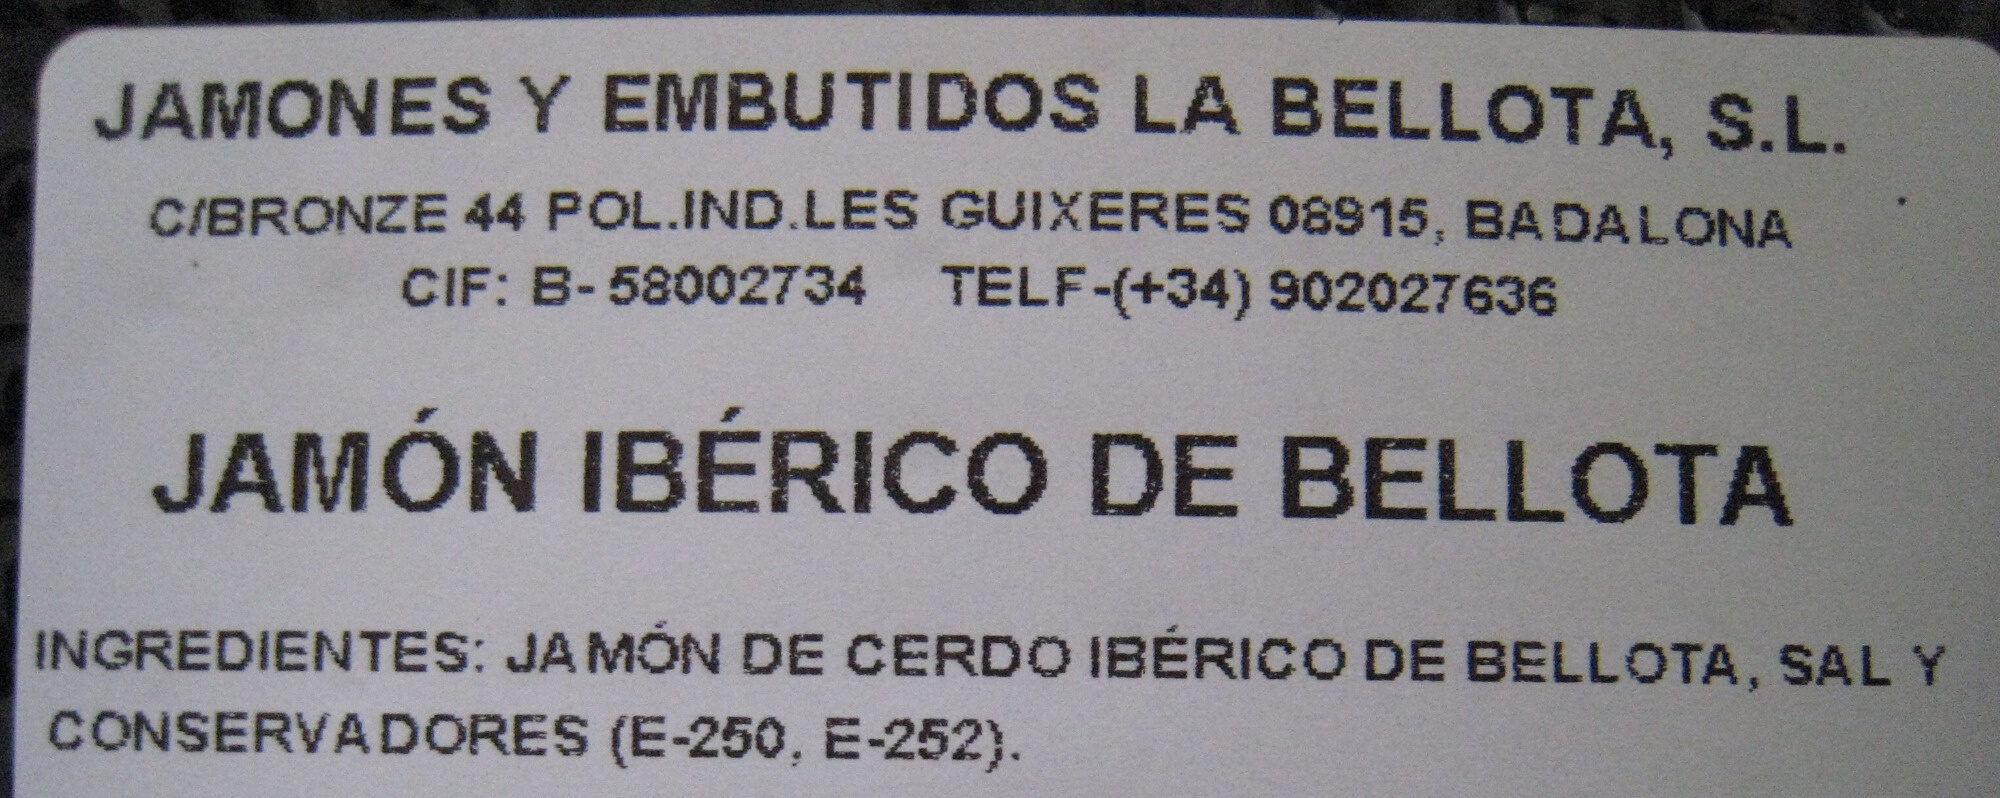 Jamón Ibérico 100 g de Bellota - Ingredientes